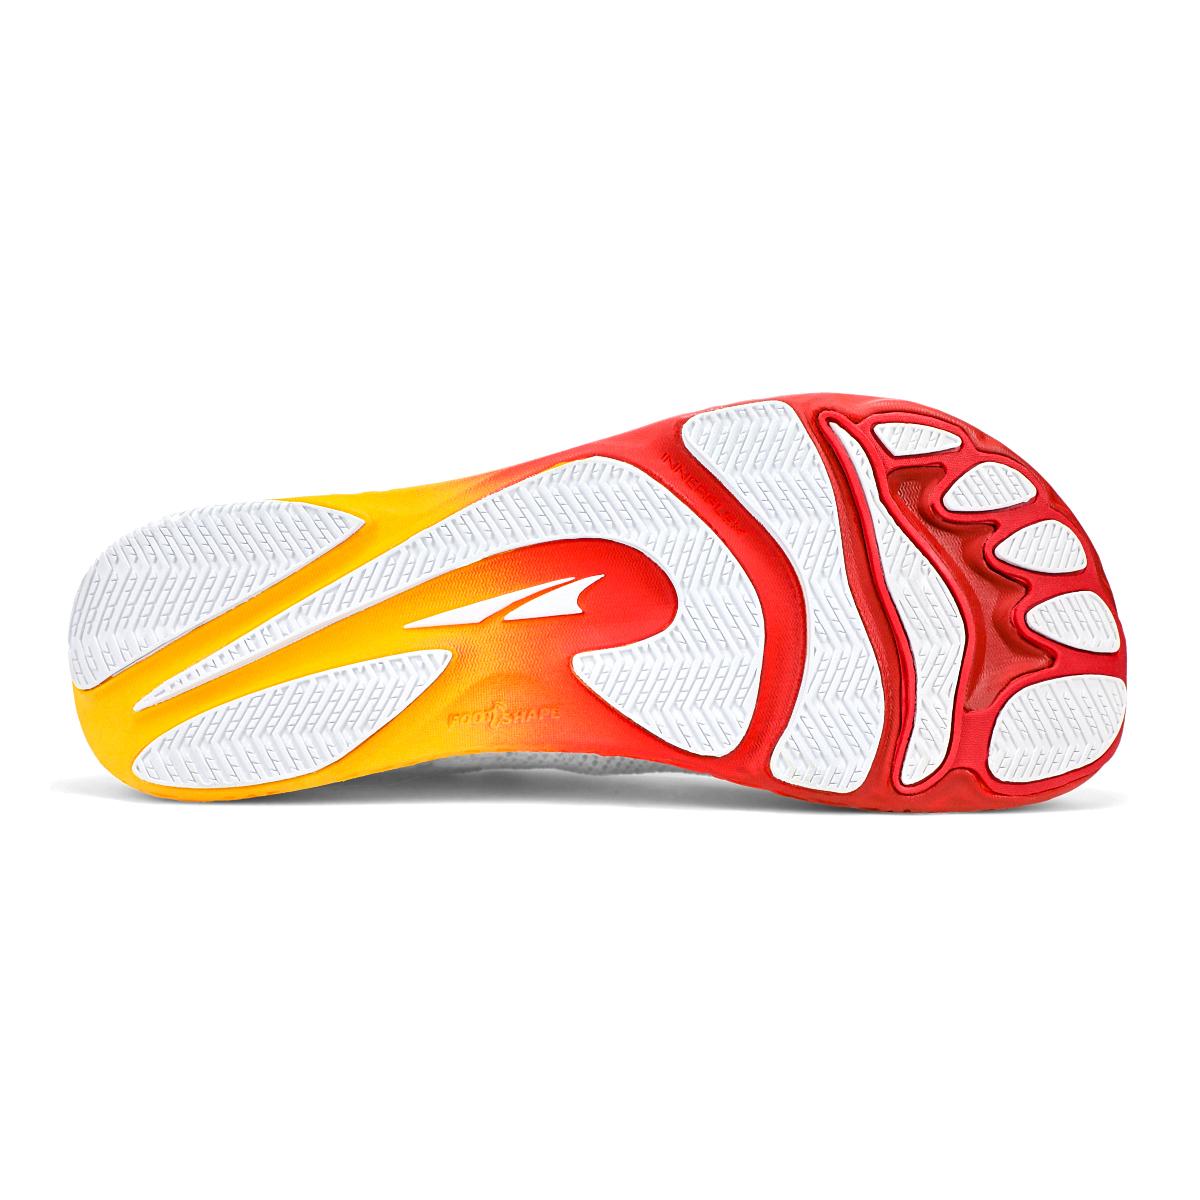 Men's Altra Escalante Racer Running Shoe - Color: White/Orange - Size: 7 - Width: Regular, White/Orange, large, image 3